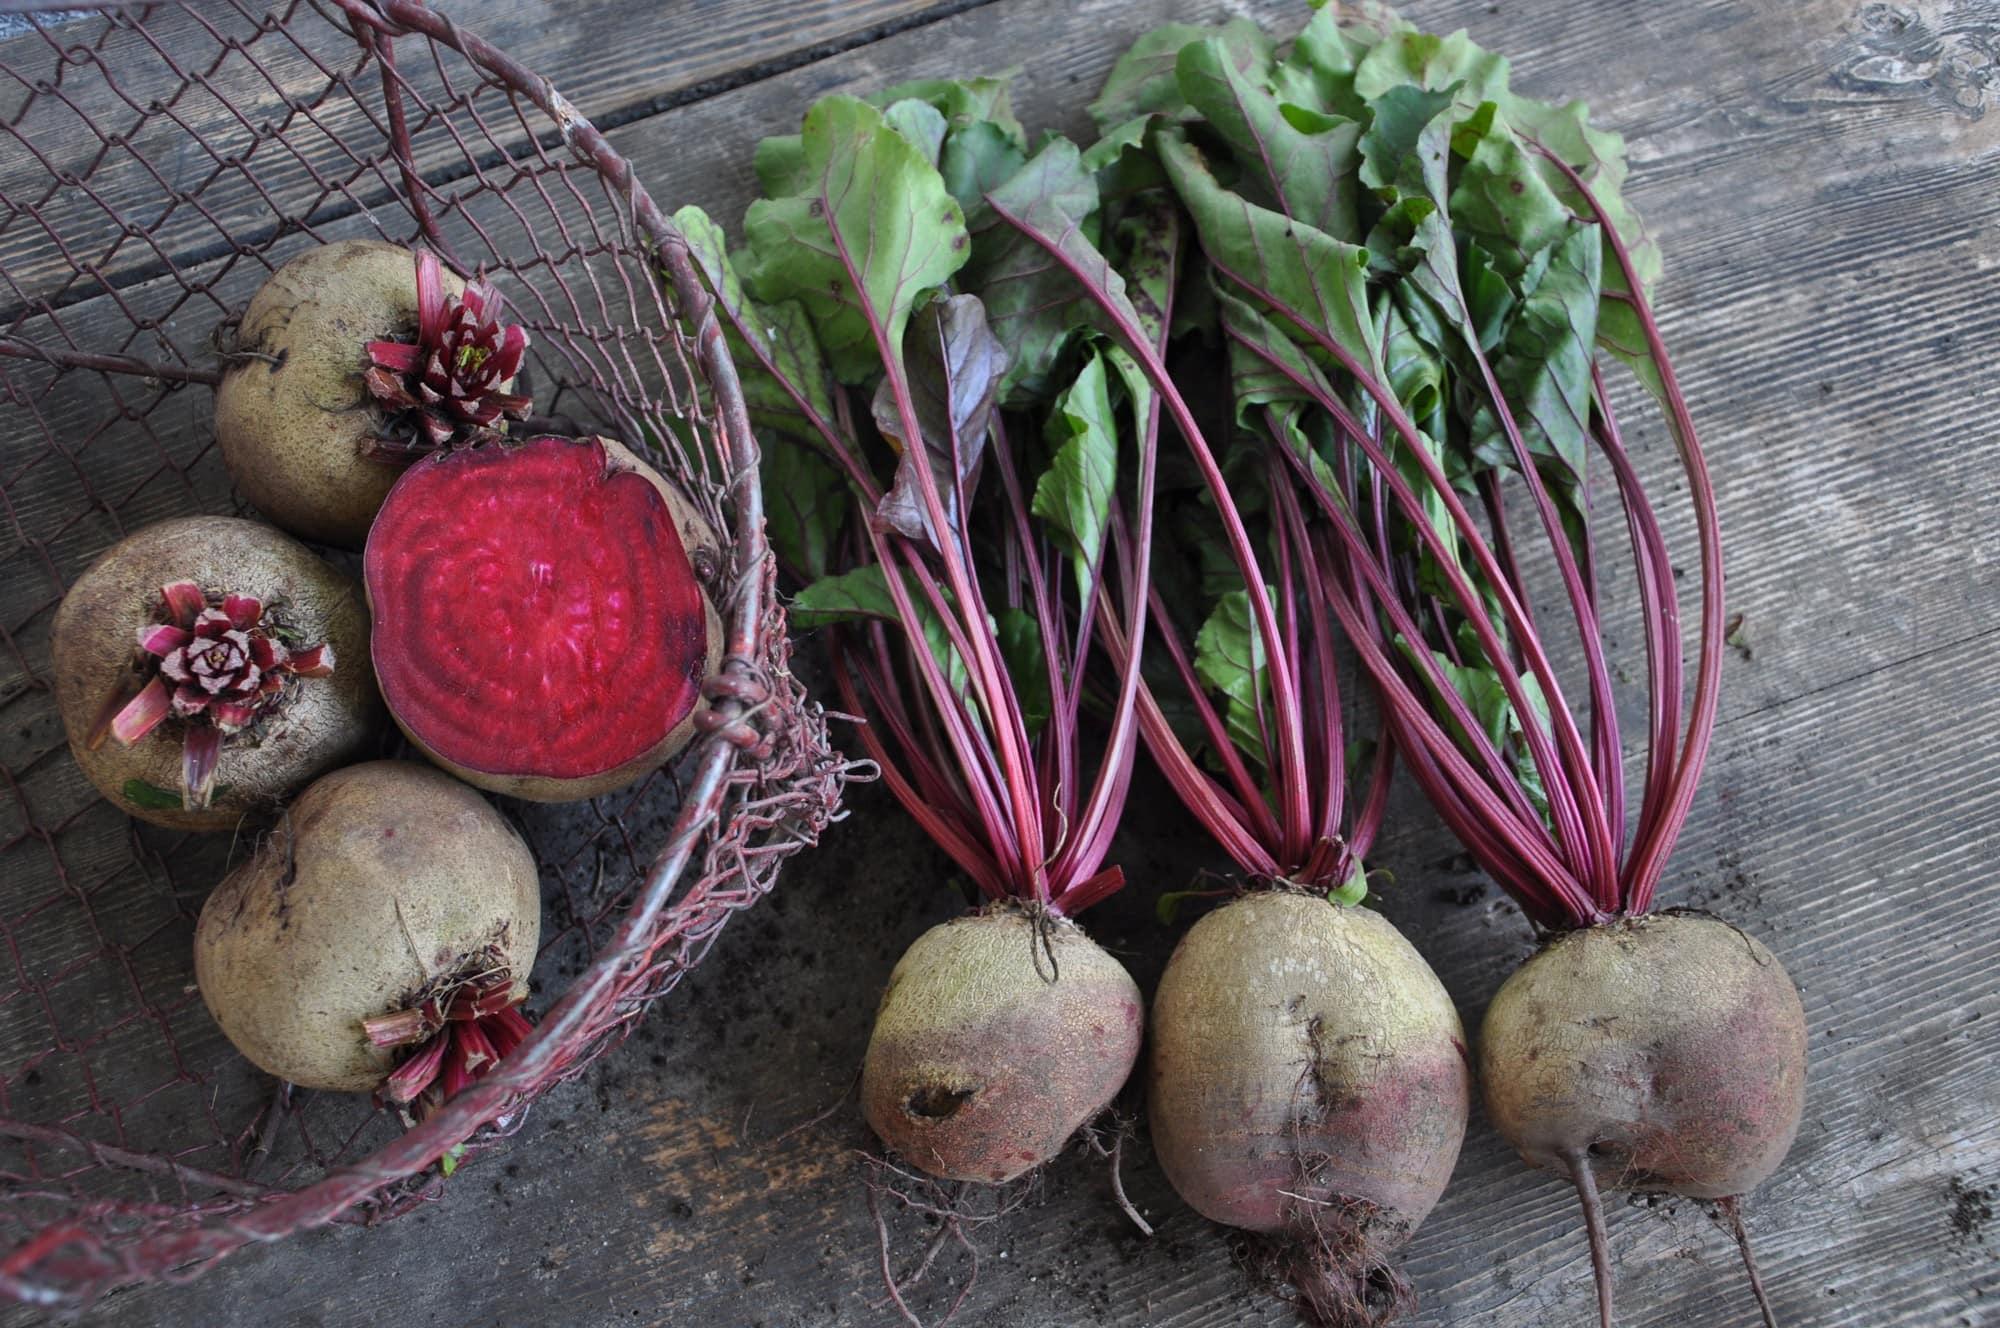 Rote Rueben Peakini Farmhaus Web - PEAKINI WINTERPROVIANT: Rote Rüben Saft